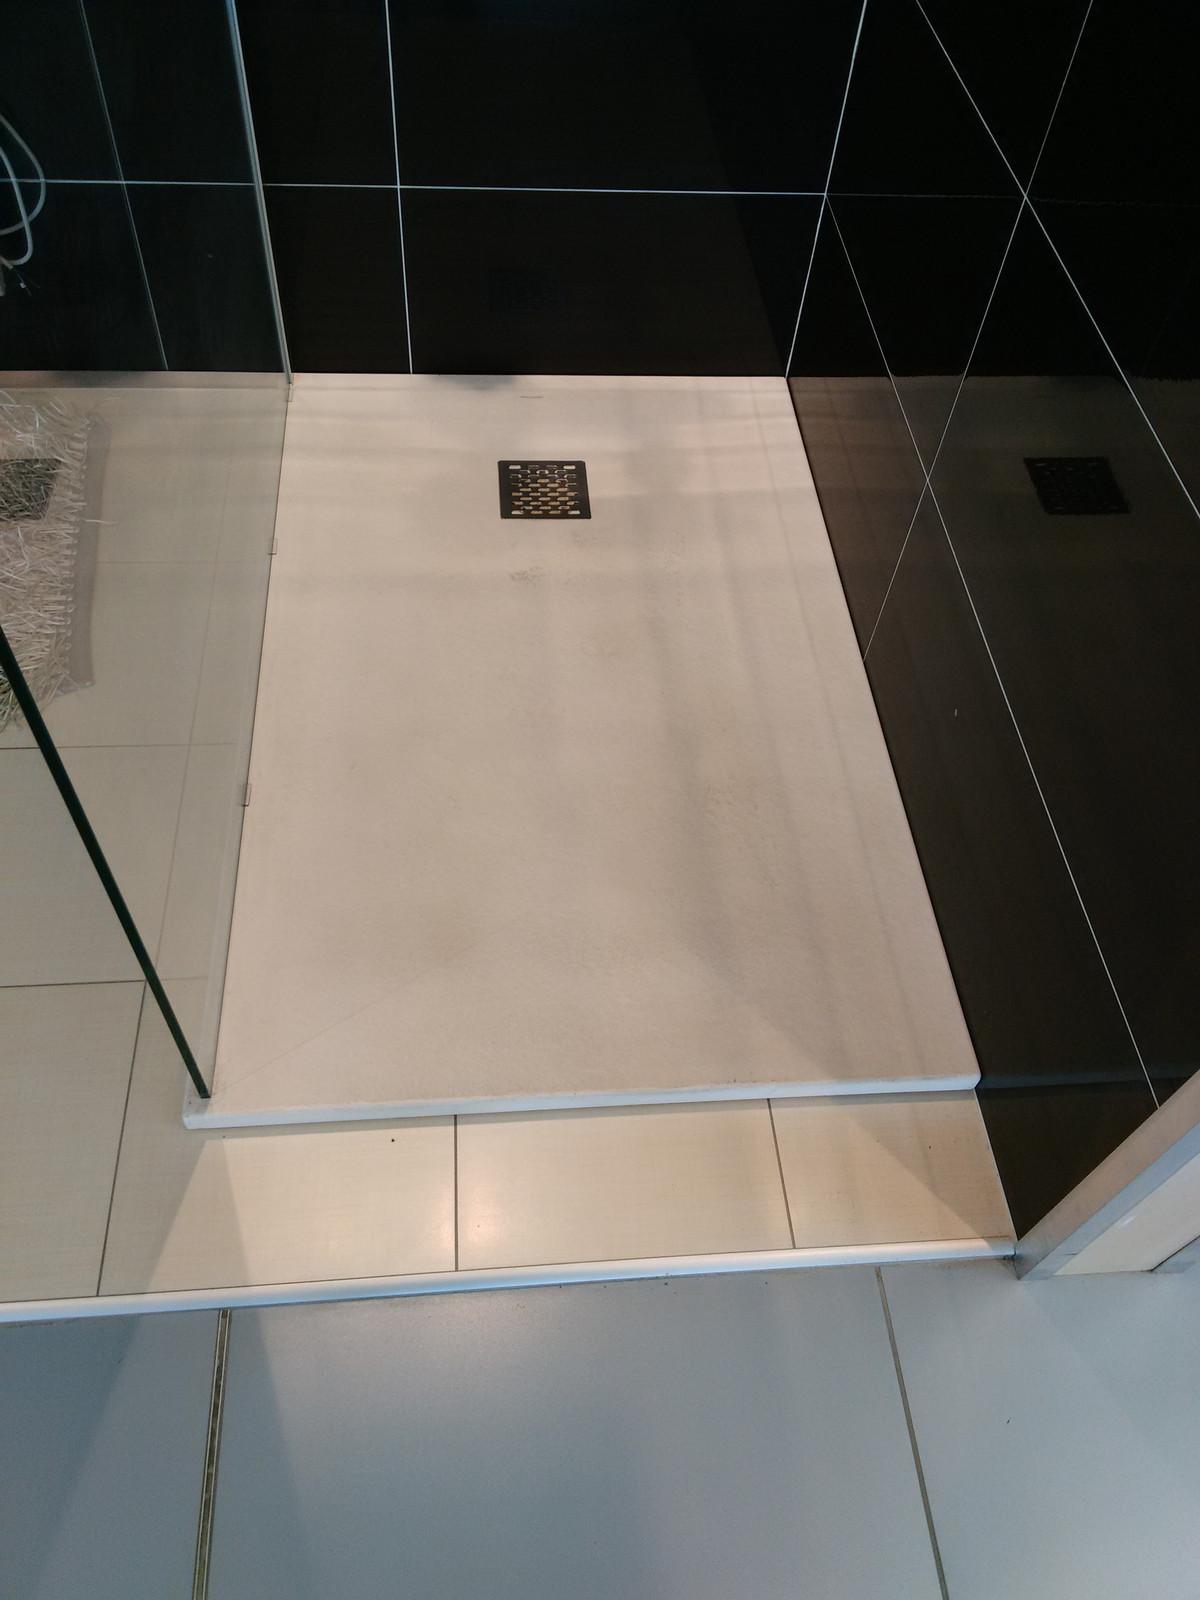 Etagere Salle De Bain Ikea ~ Receveur Centuria Nox Stone 400 Euros Ttc Vf Confort Salle De